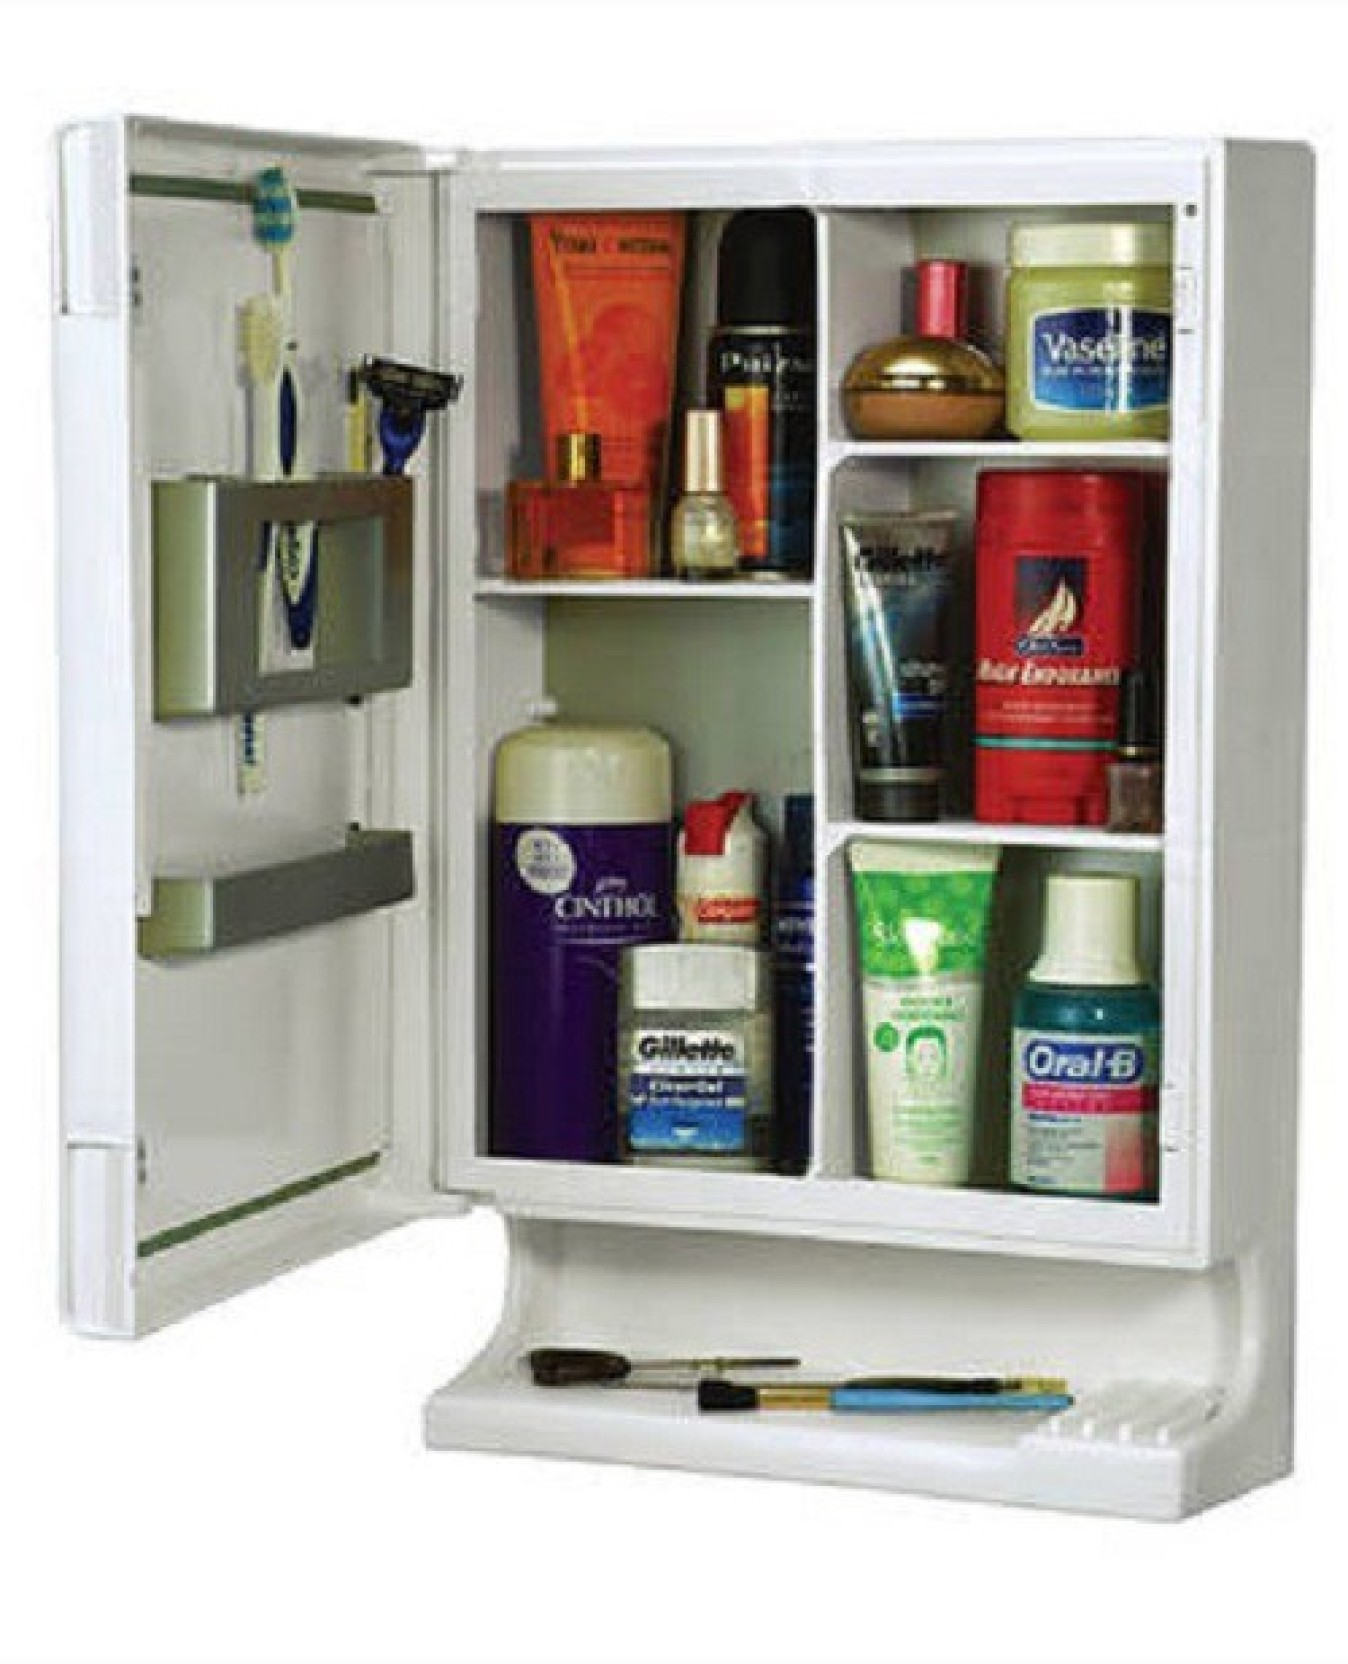 Cipla Plast Bathroom New Look Mirror Cabinet Plastic Wall Shelf Price In India Buy Cipla Plast